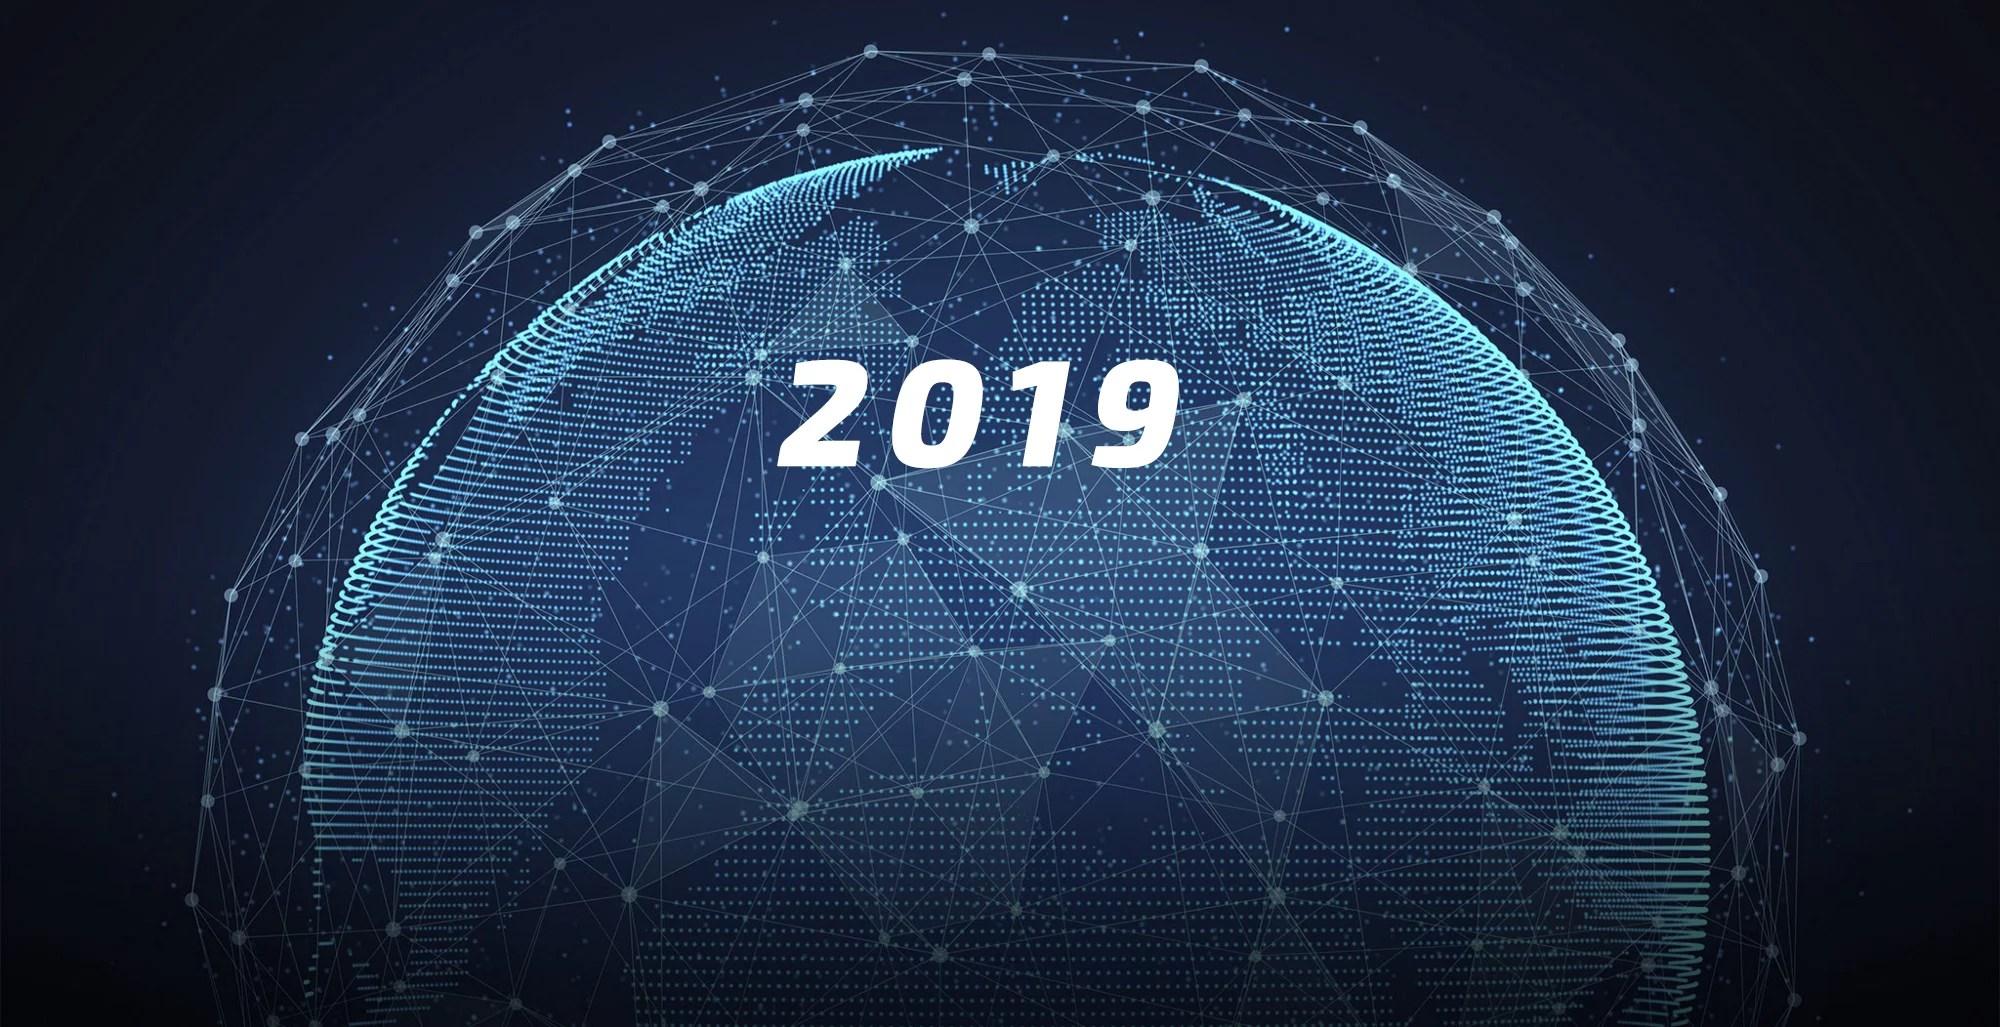 BBVA Next Technologies seleccionó las 4 soluciones de blockchain a seguir en el 2019